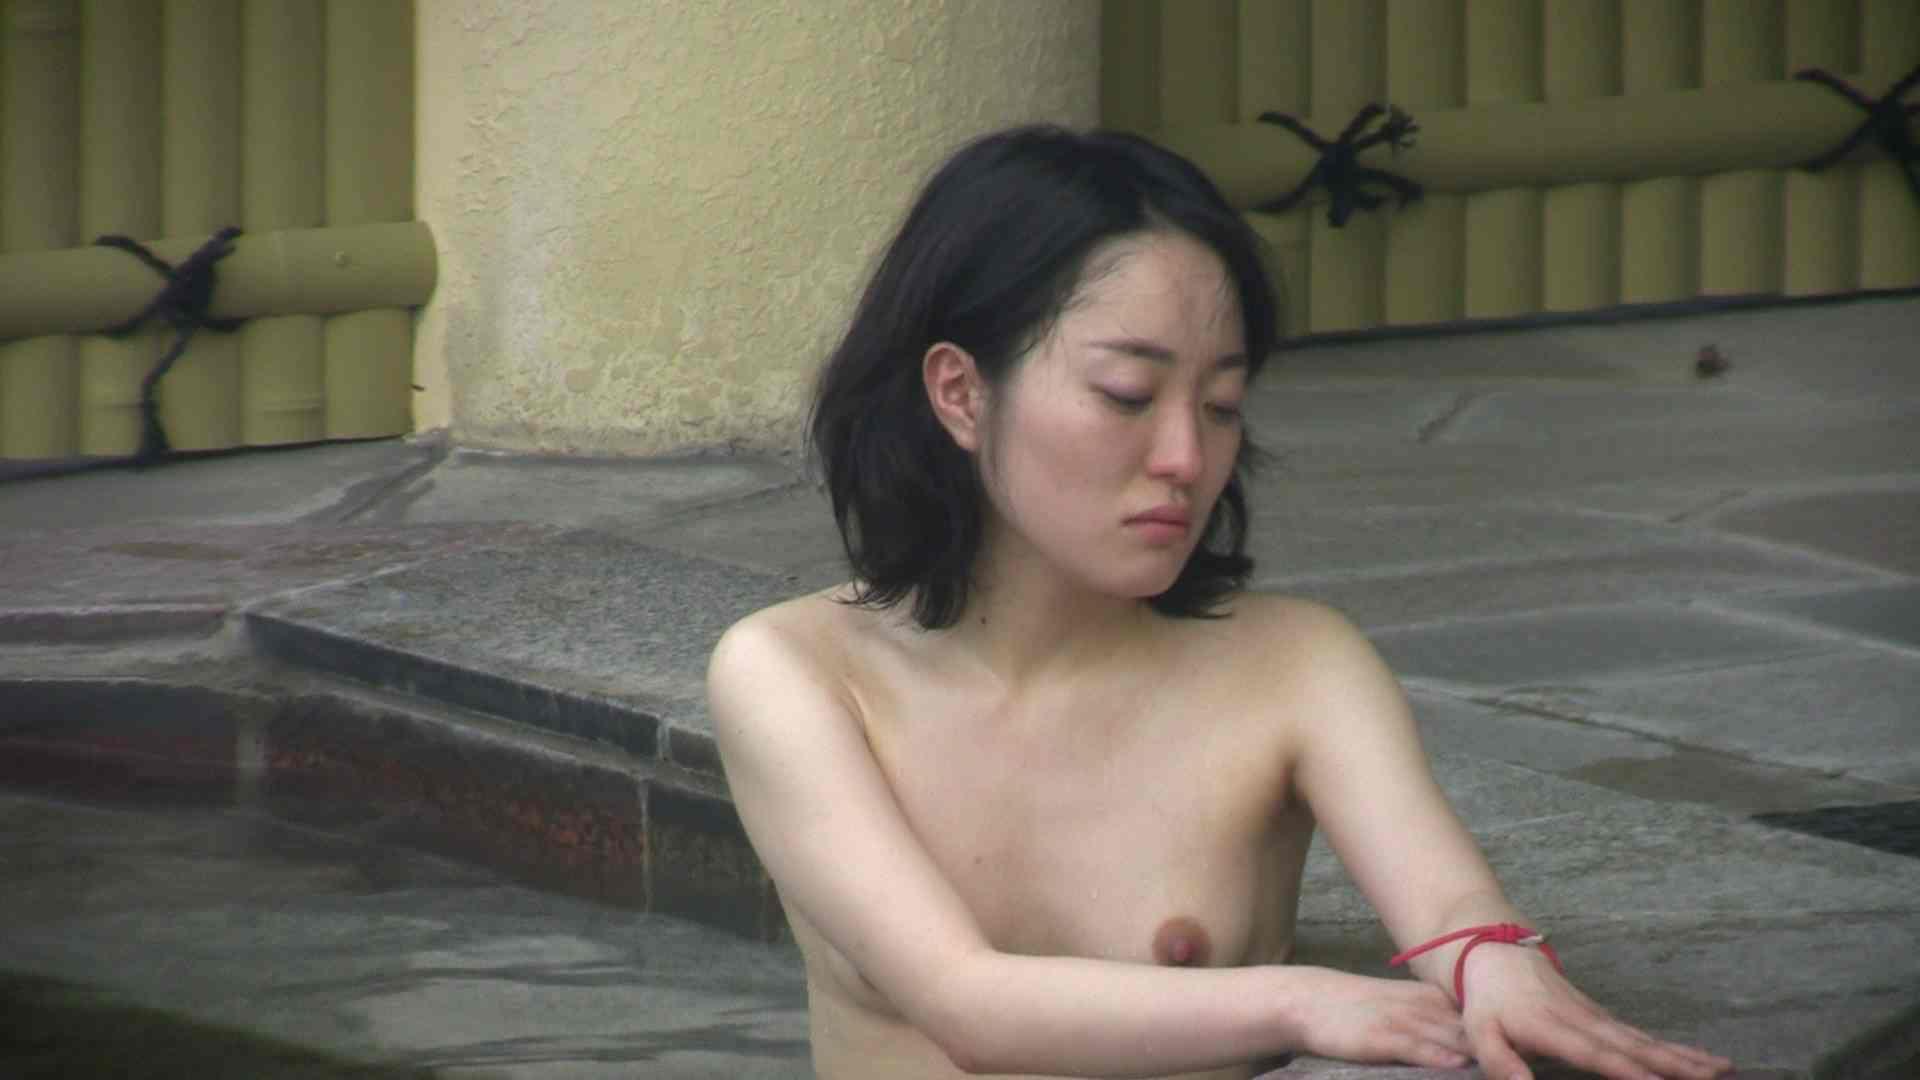 Aquaな露天風呂Vol.681 露天 | OLセックス  98画像 64